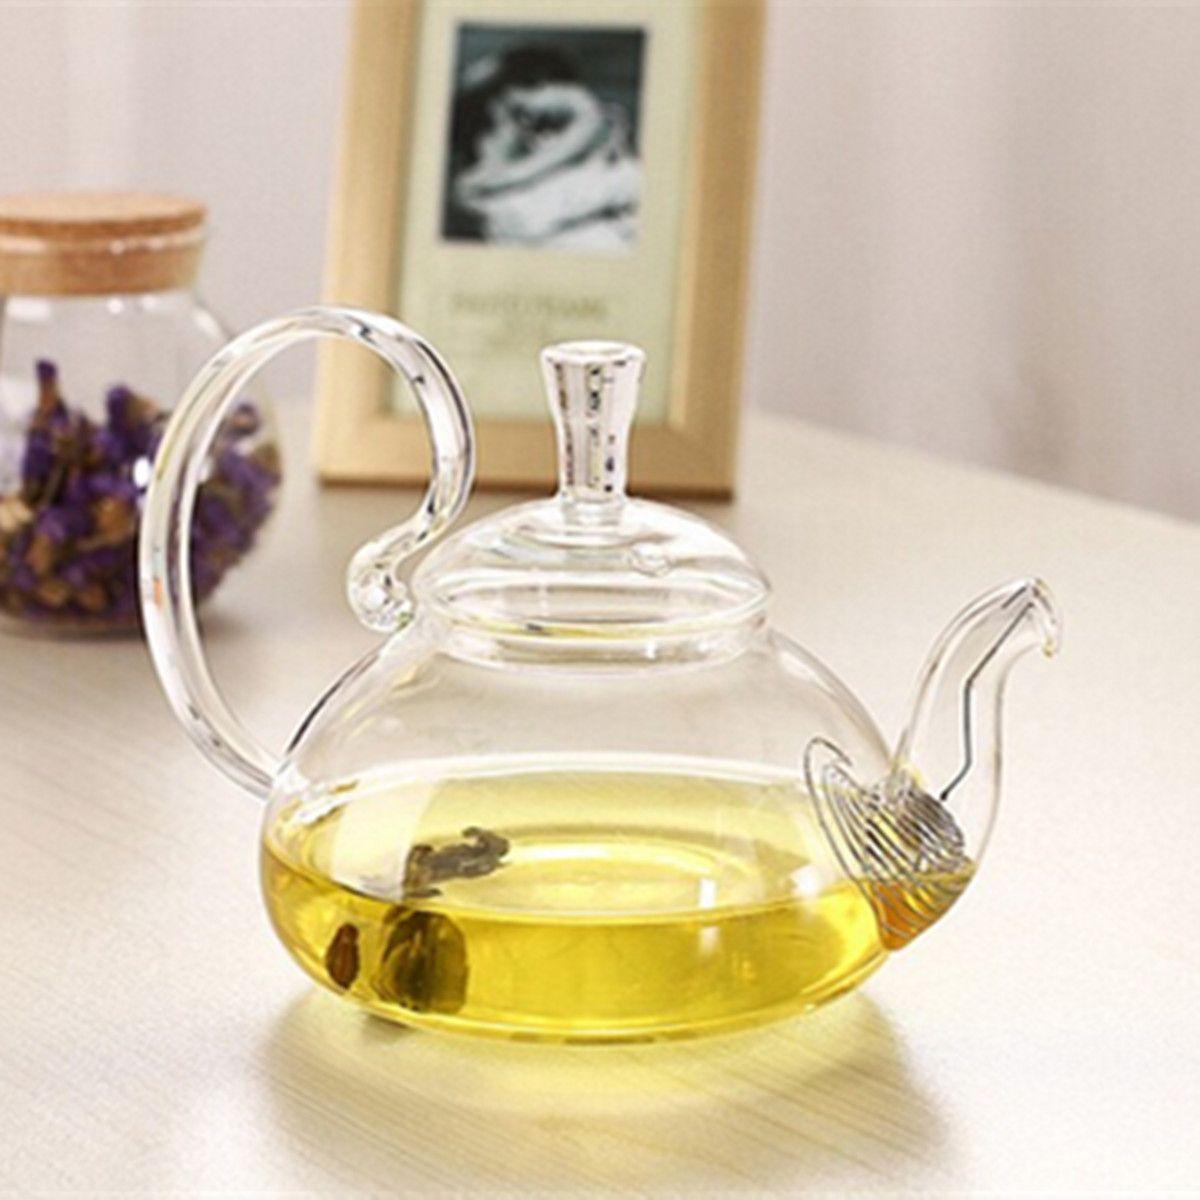 Best Teapots For Brewing Tea And Keeping It Hot Best Online Organic Tea Pots Heat Resistant Glass Green Leaf Tea